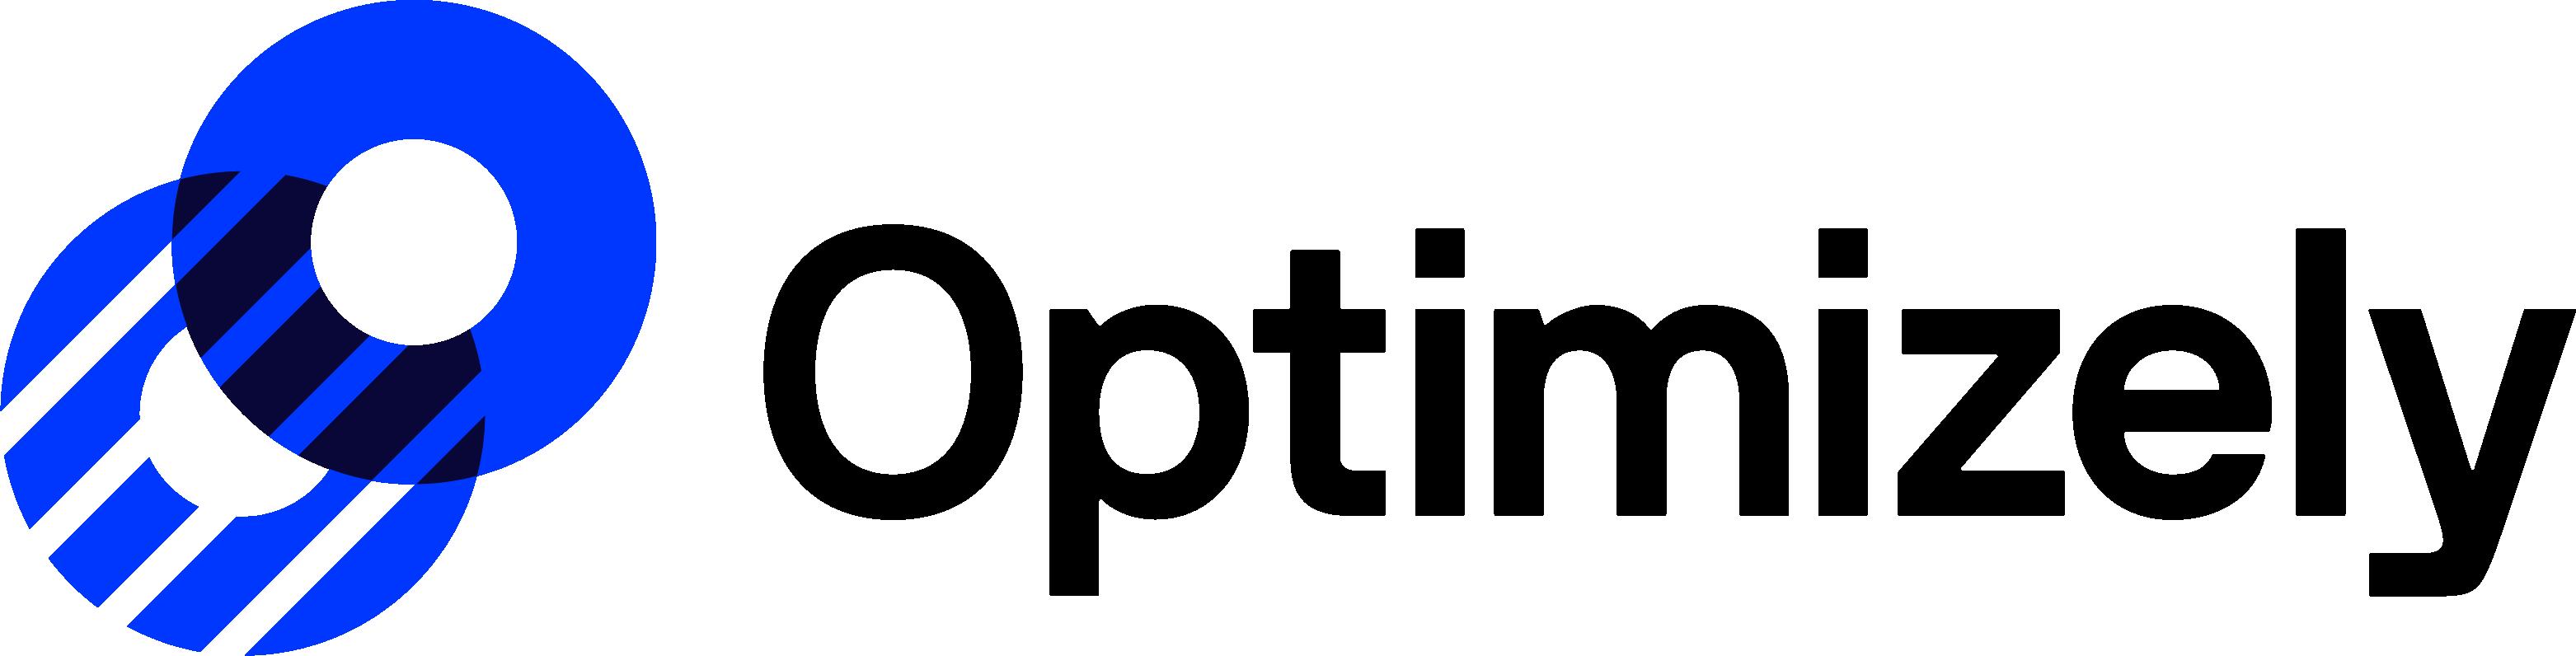 optimizely_logo_primary_full_color_dark